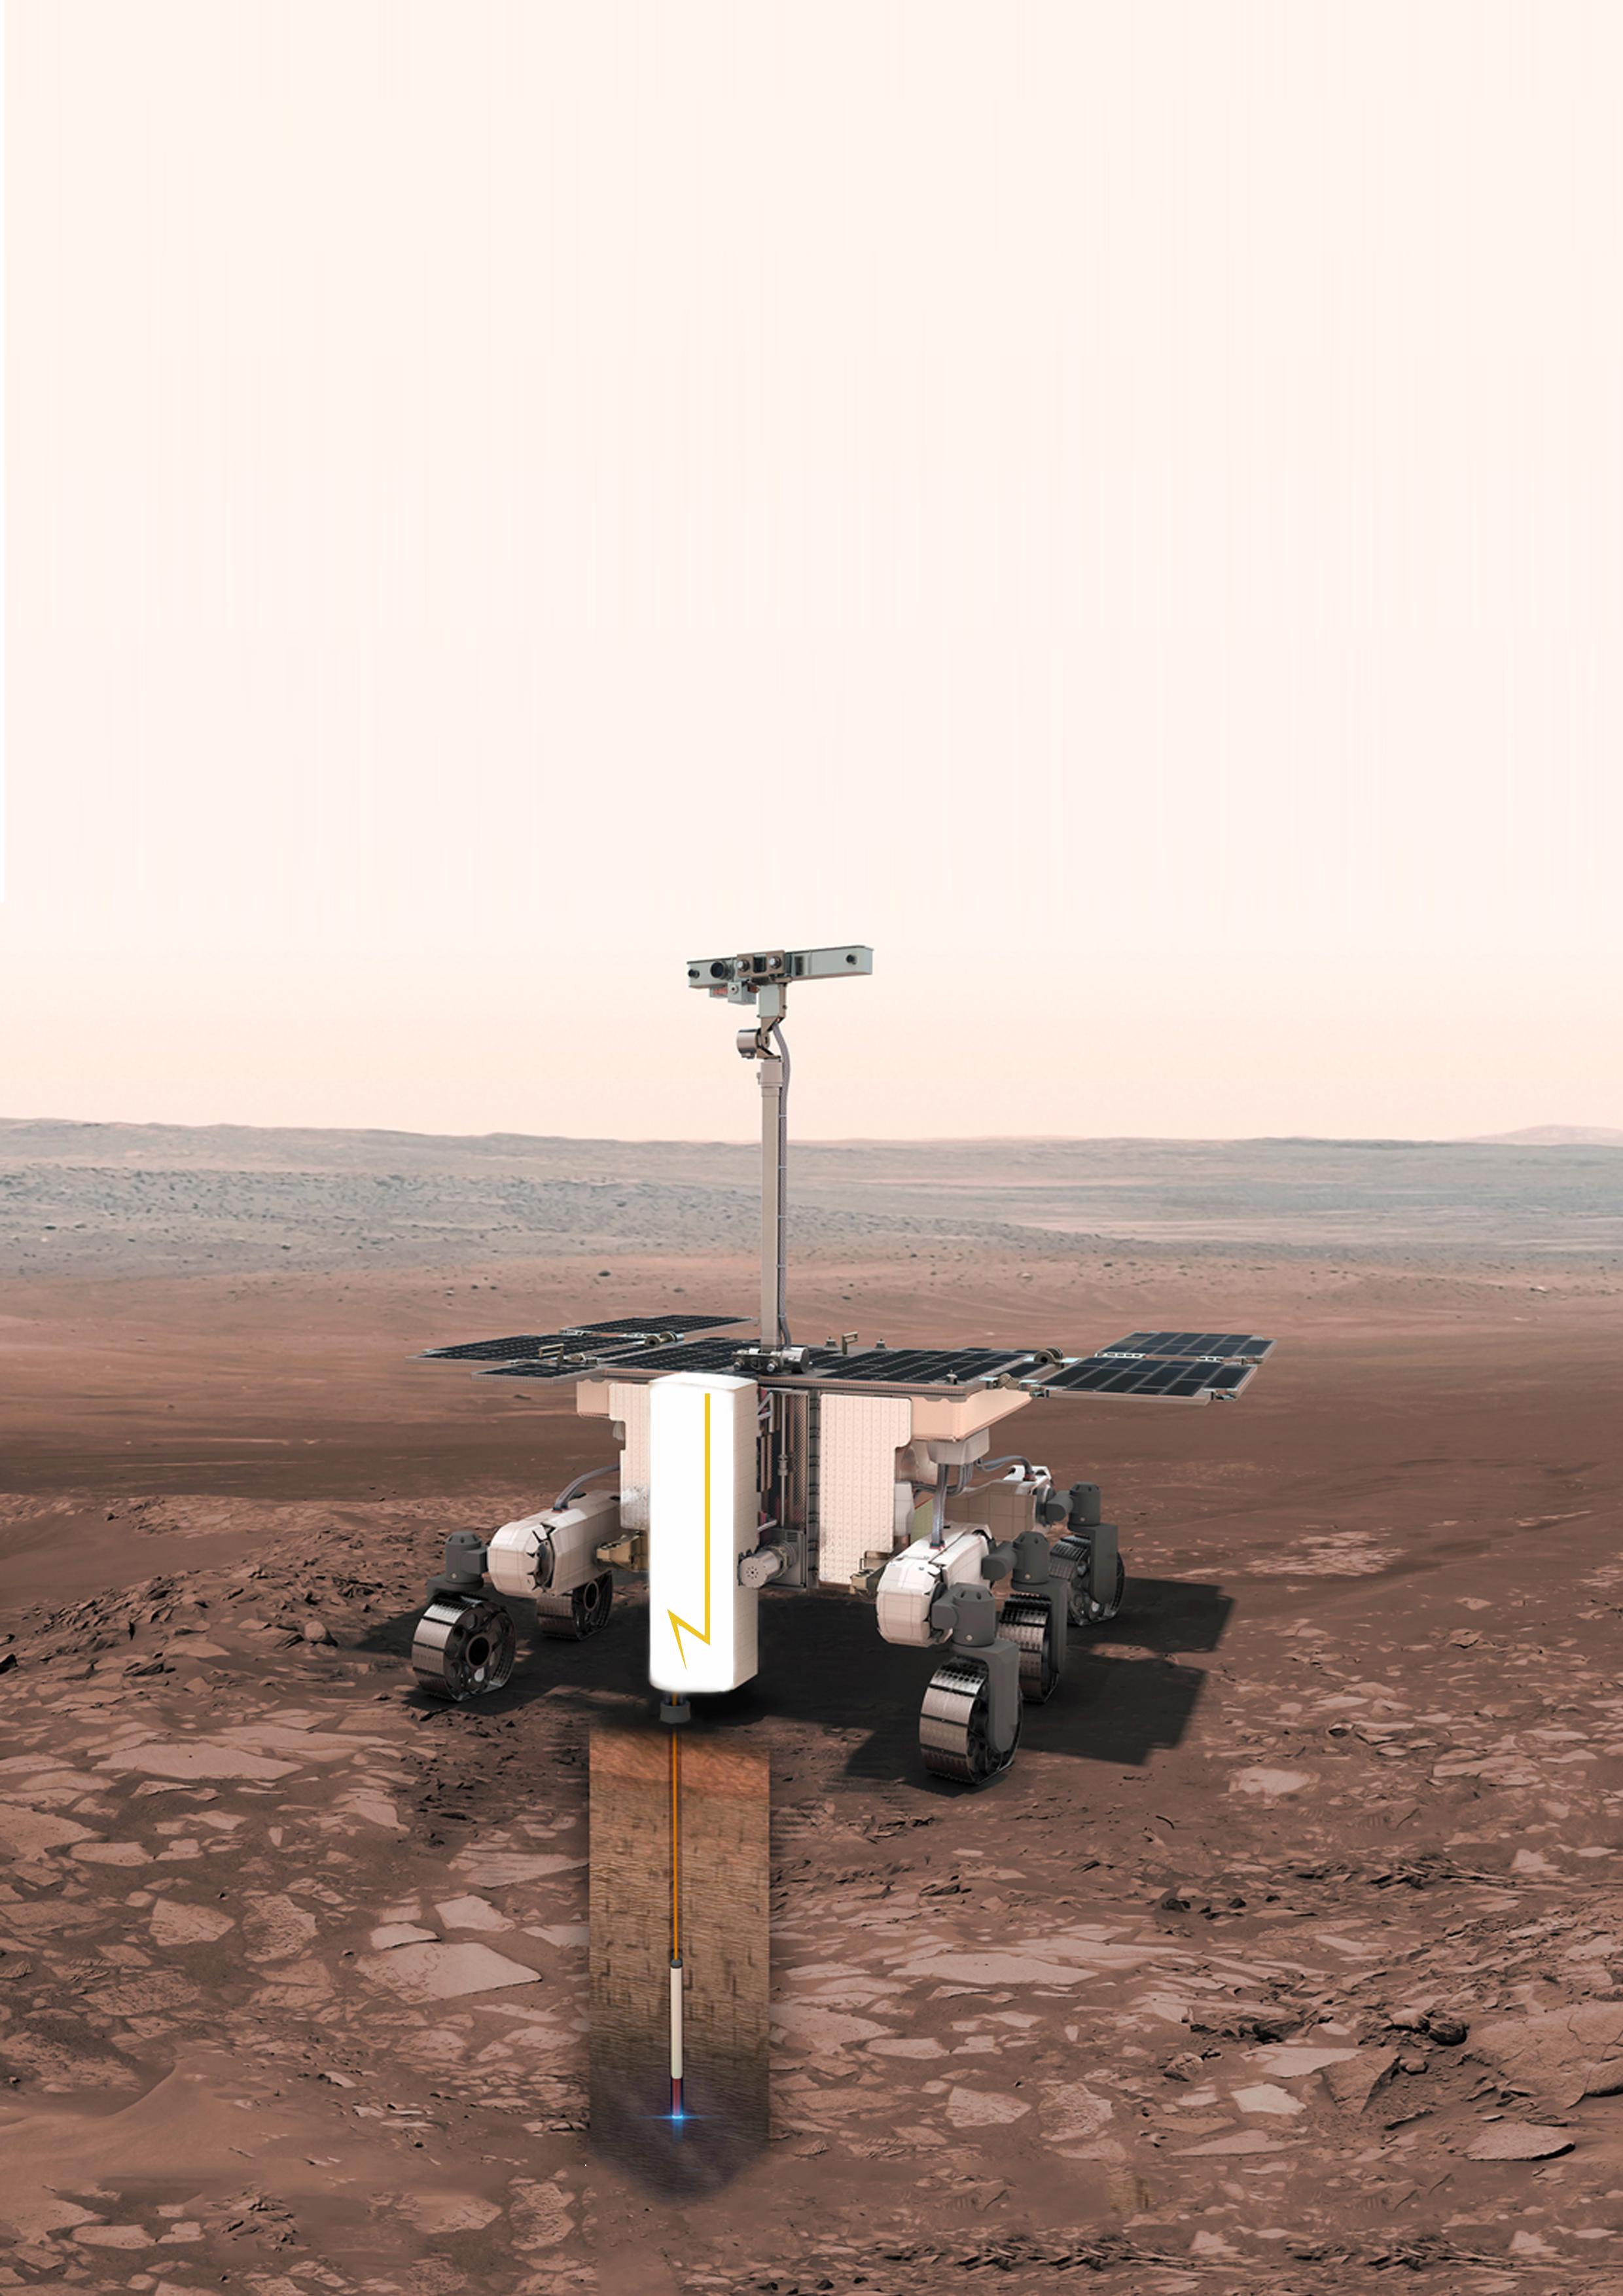 mars rover drill status - photo #12